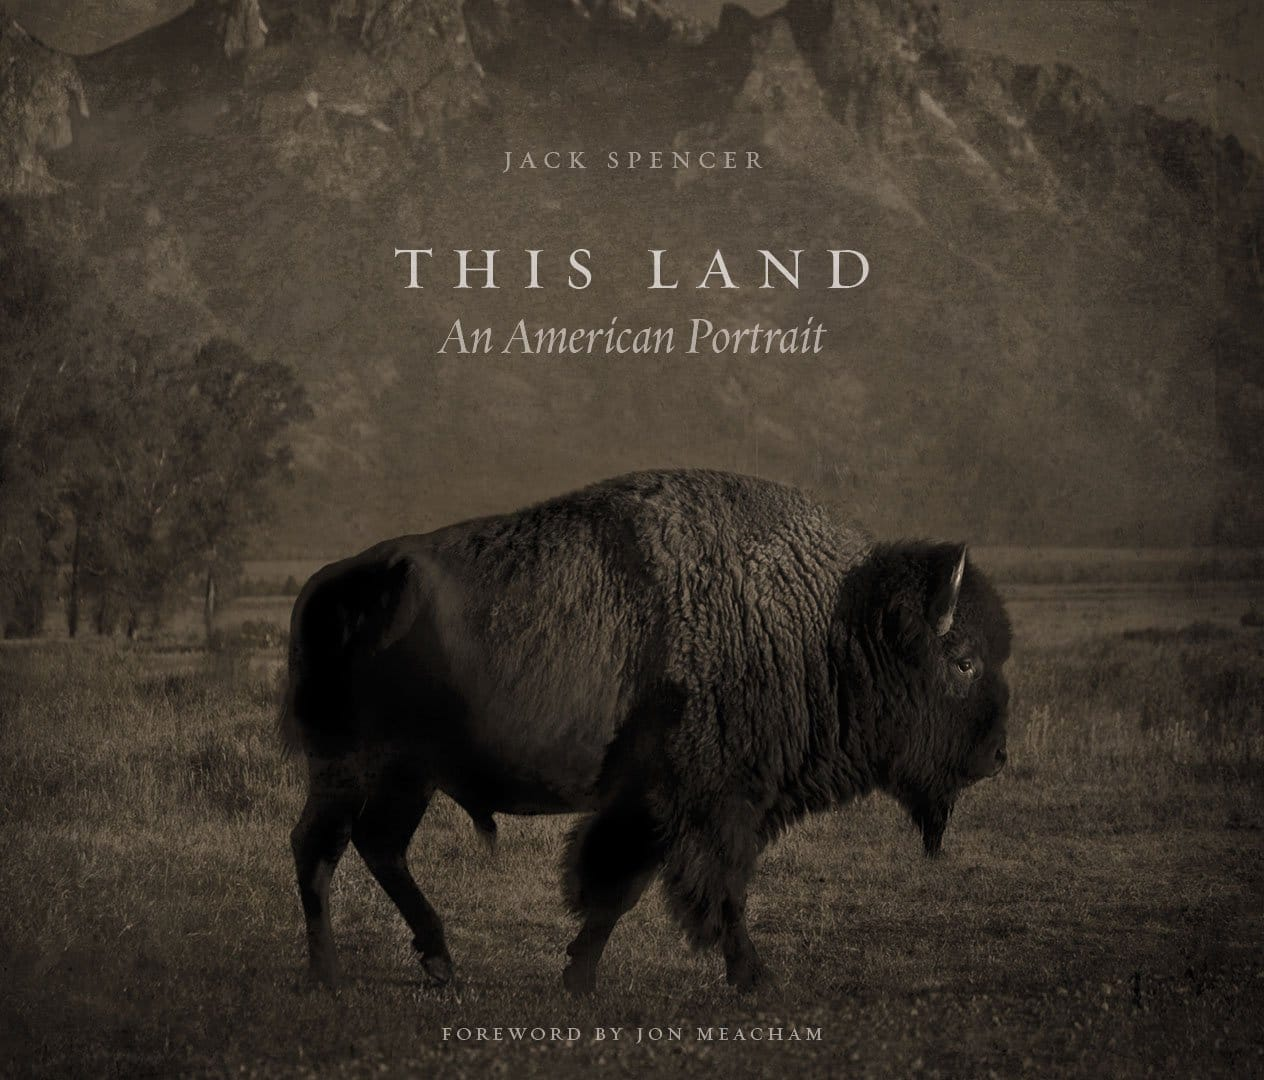 This Land, de Jack Spencer